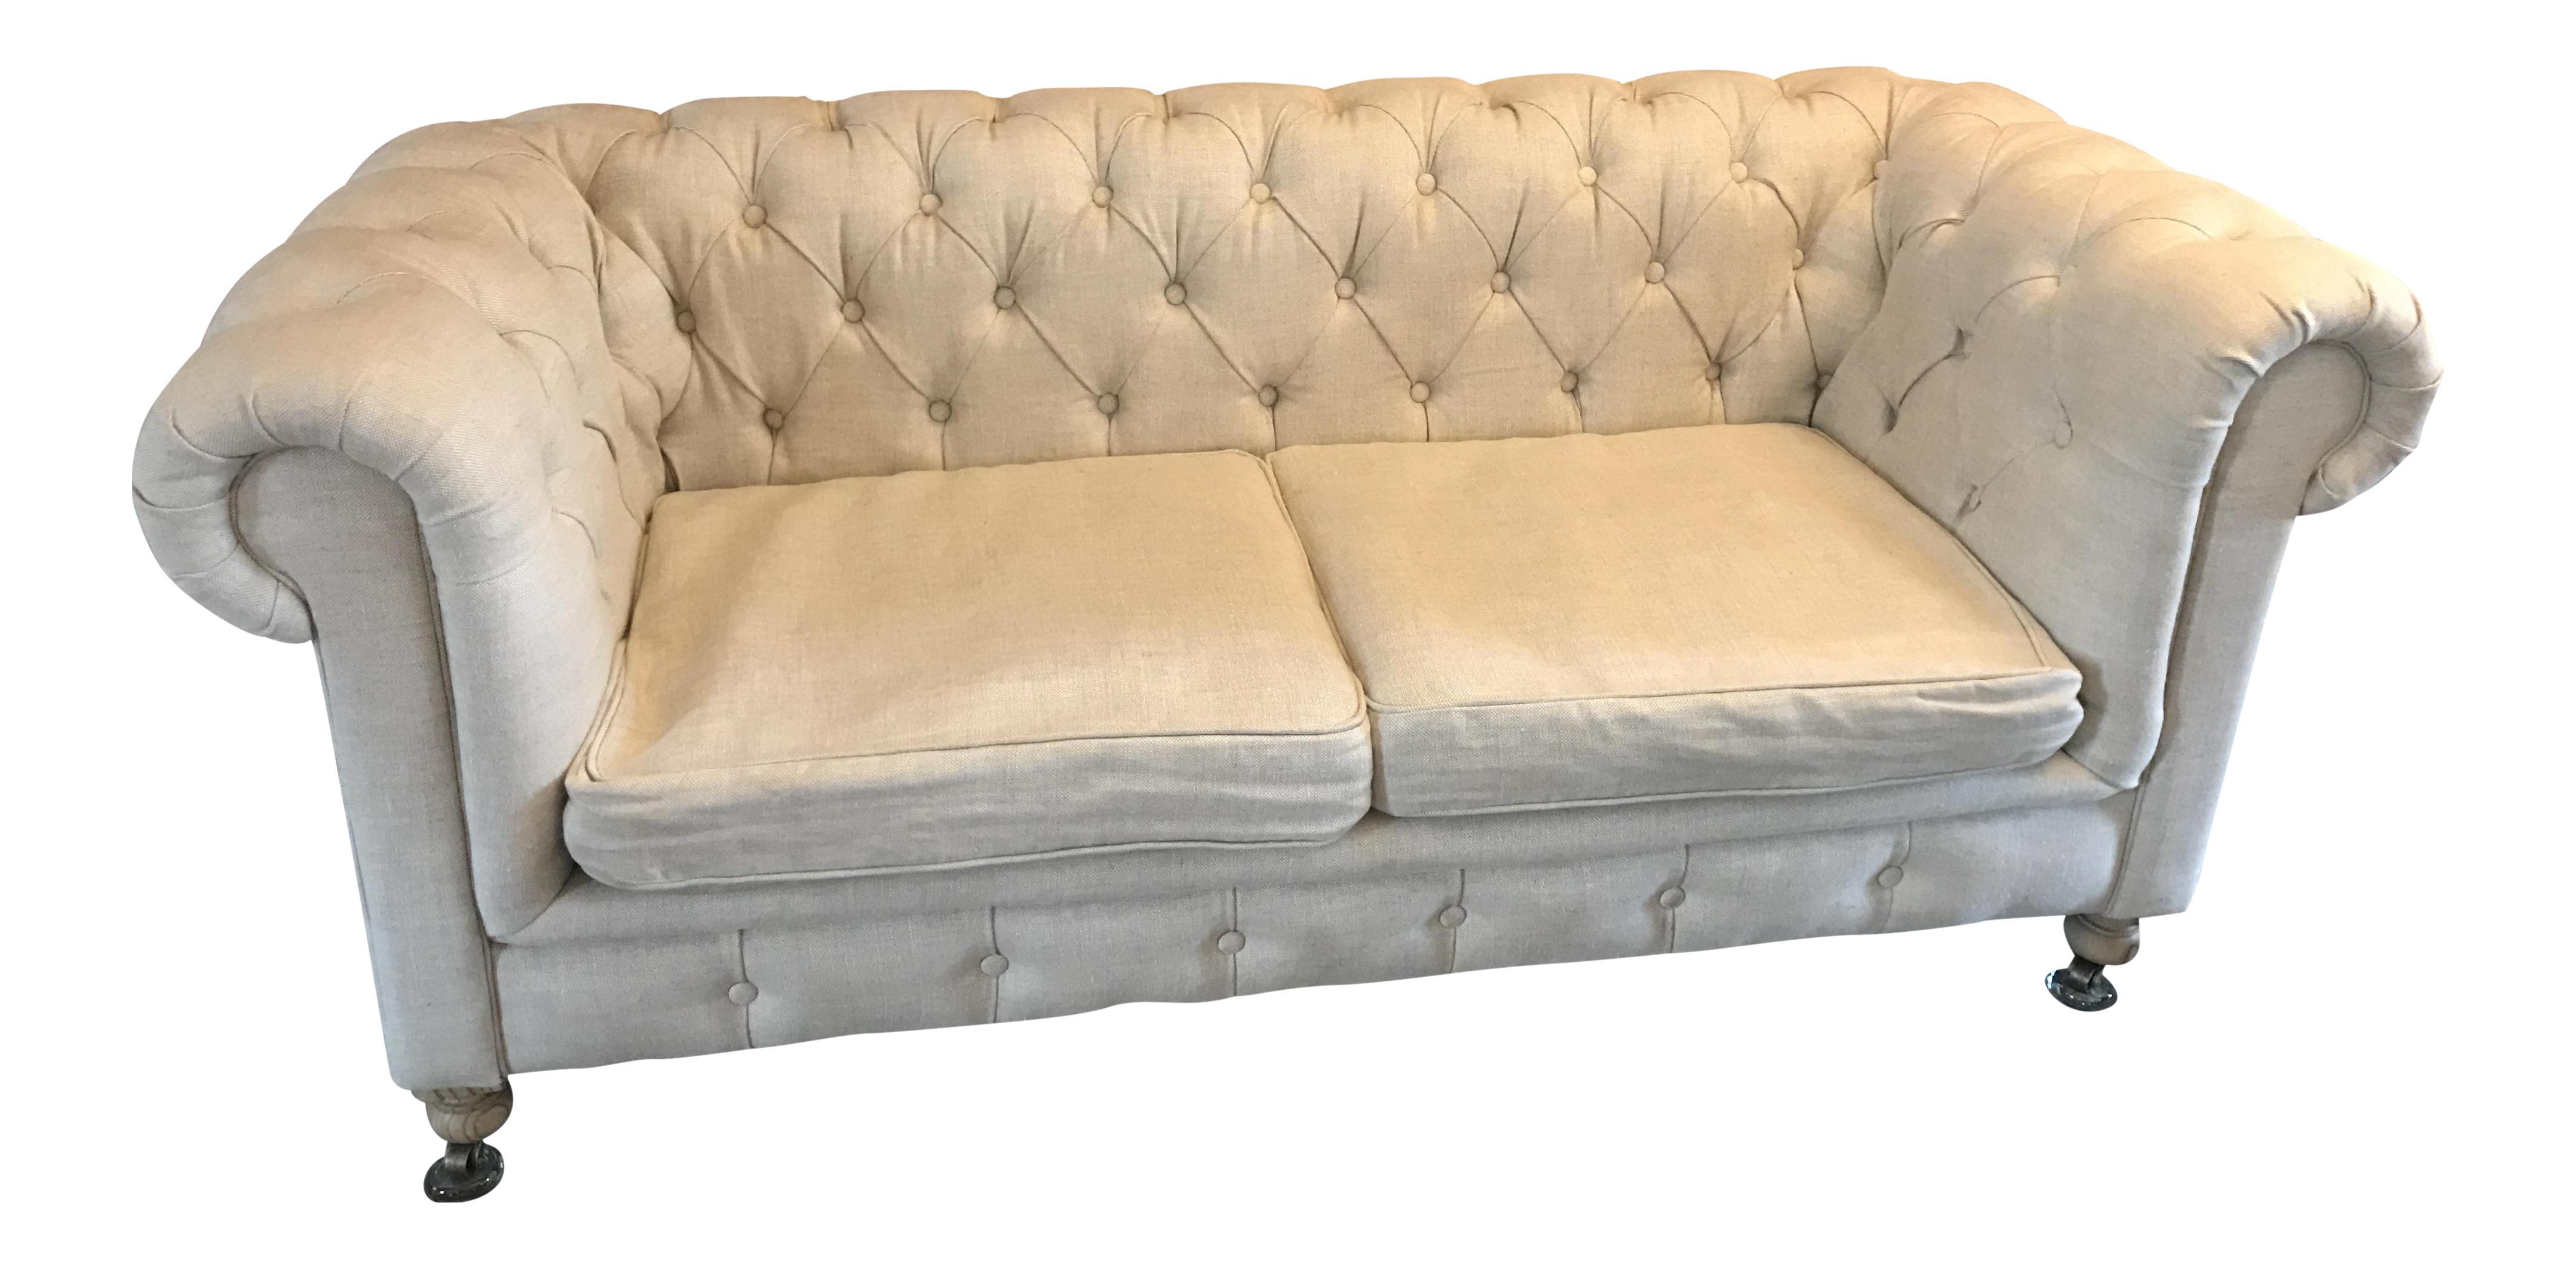 Restoration Hardware Petite Kensington Sofa Chairish